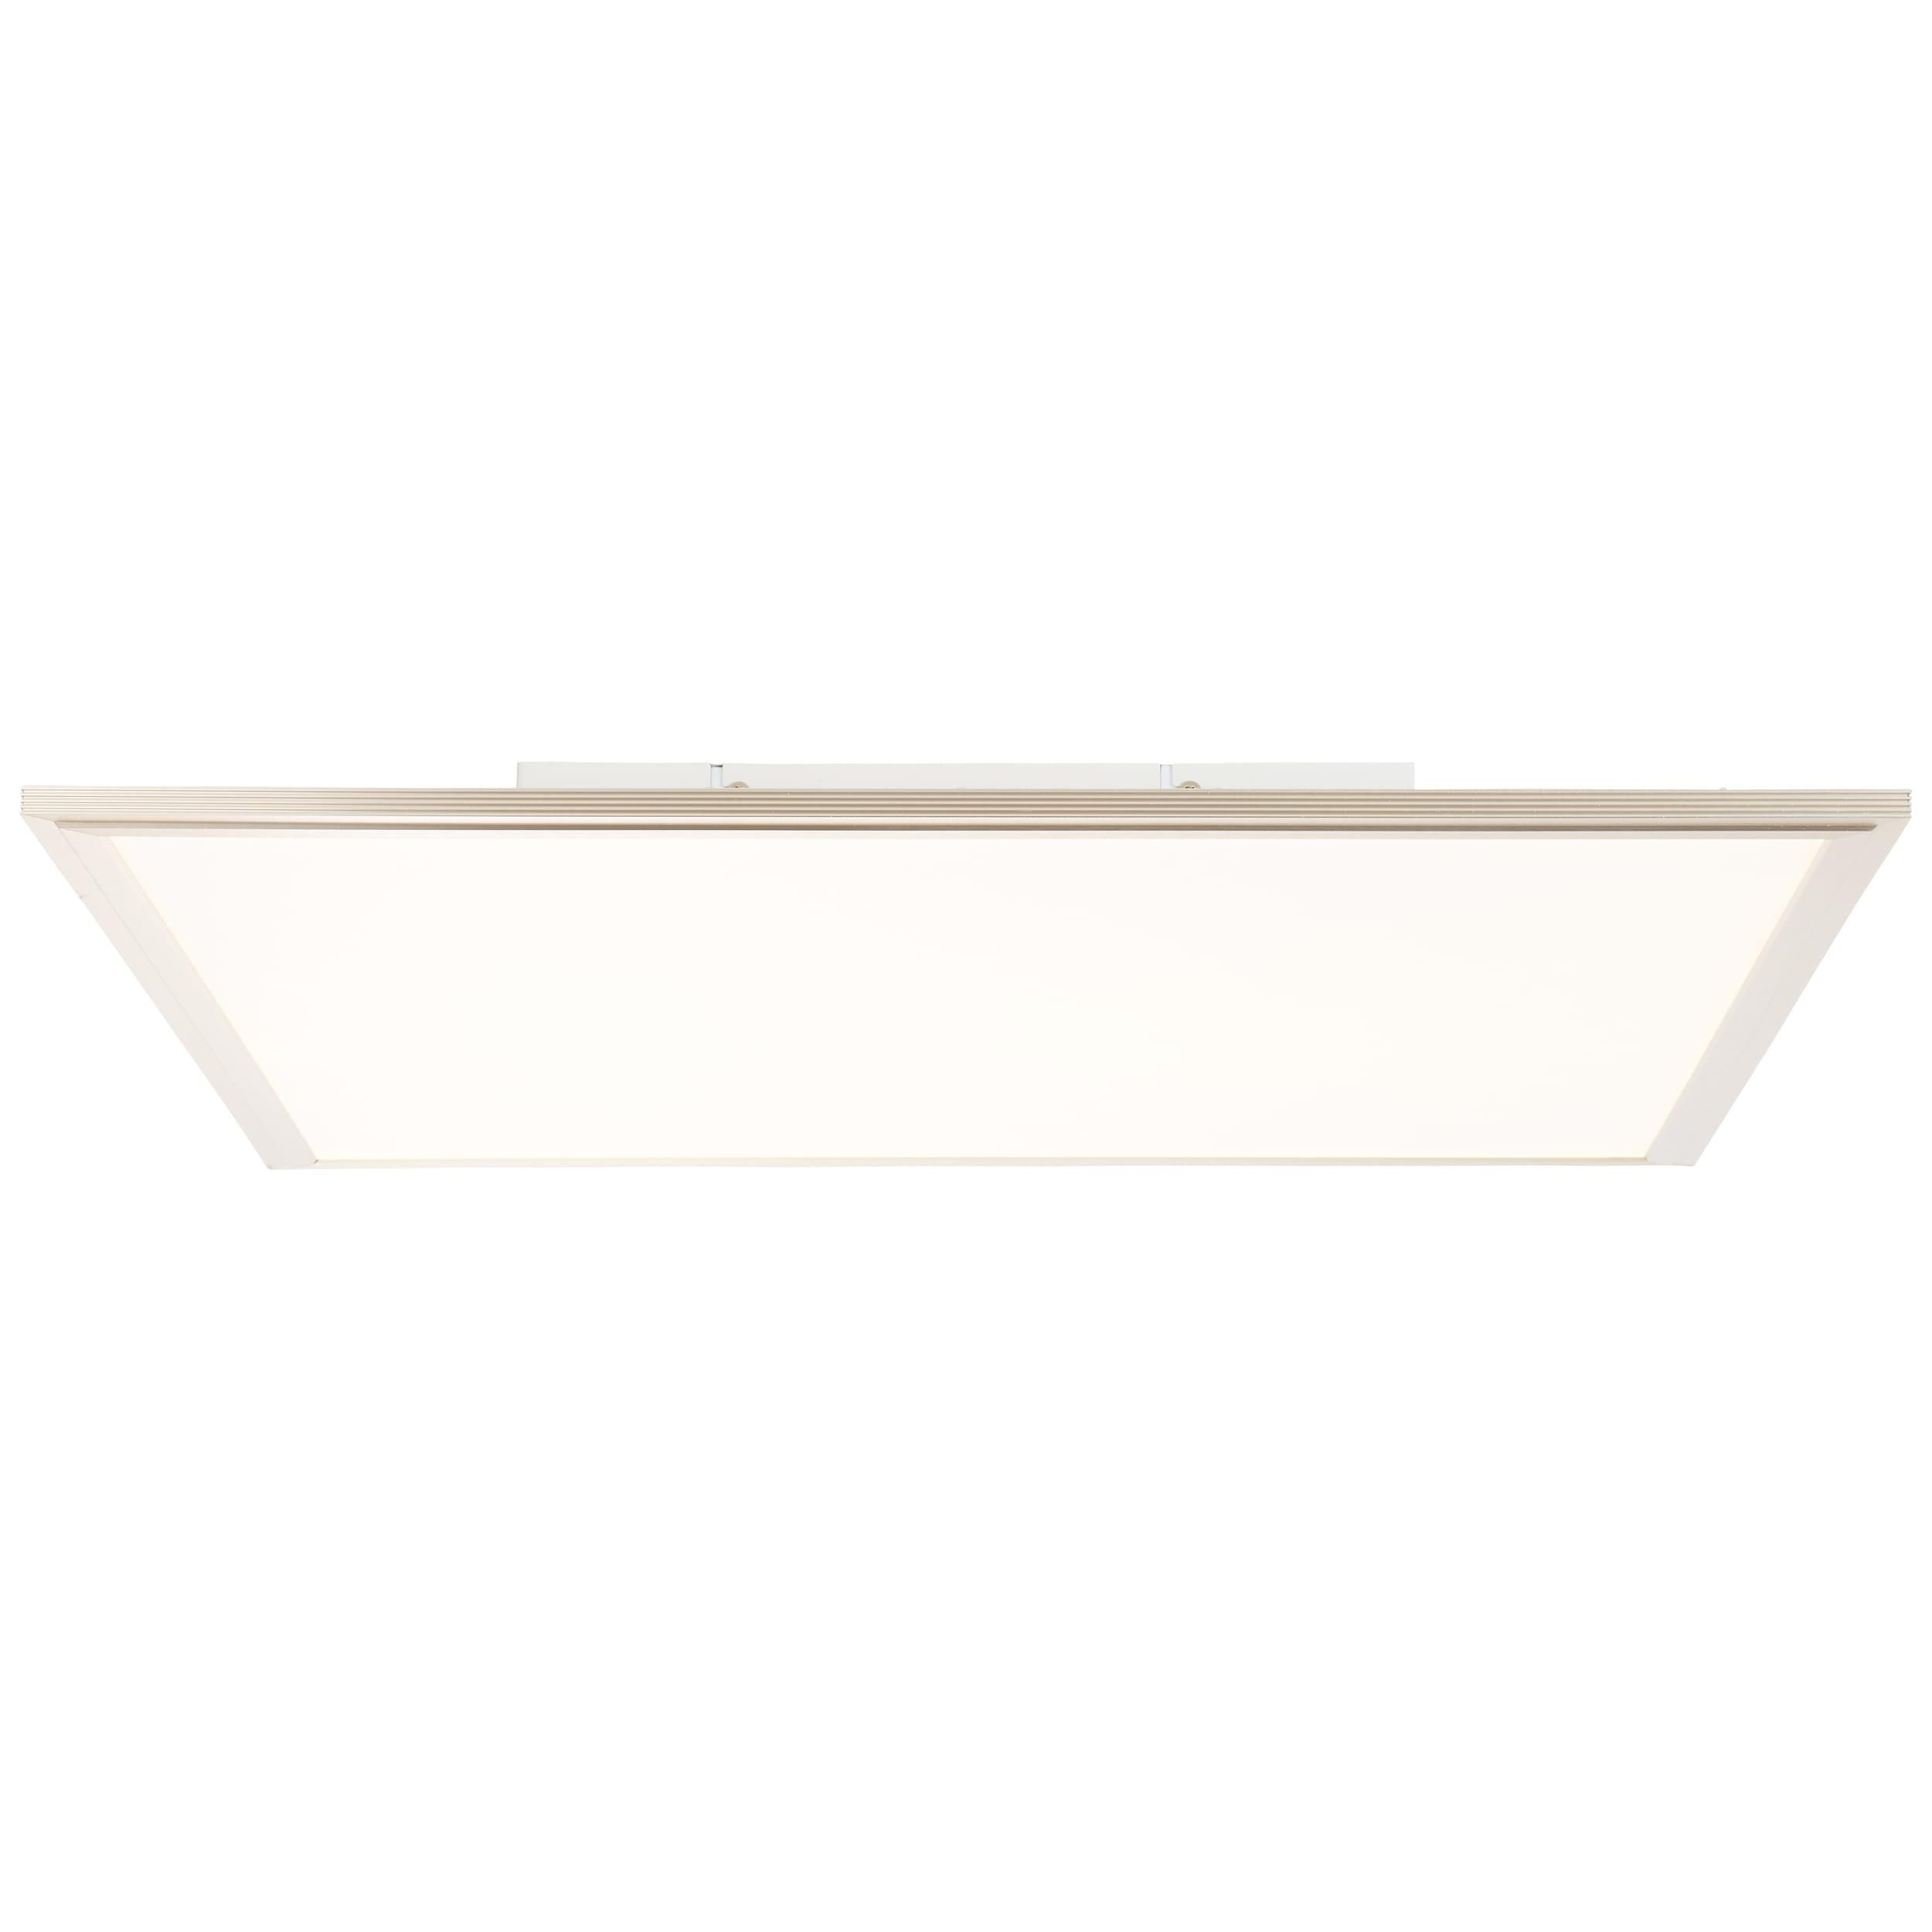 AEG Bendix LED Deckenaufbau-Paneel 60x60cm Tageslichtsensor nickel